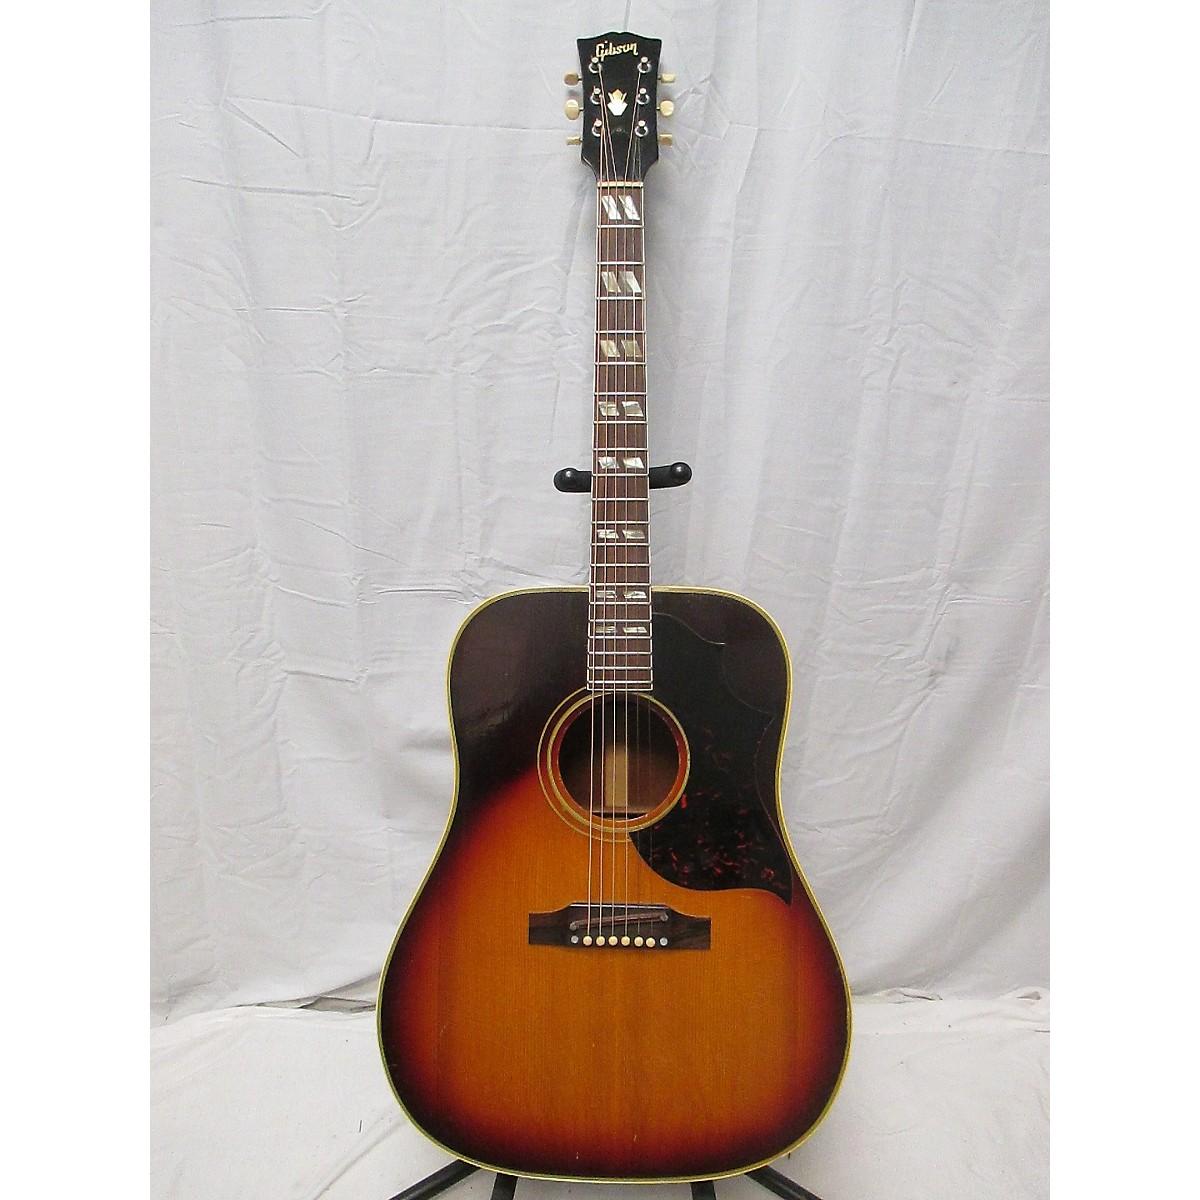 Gibson 1967 SJ Deluxe Acoustic Guitar